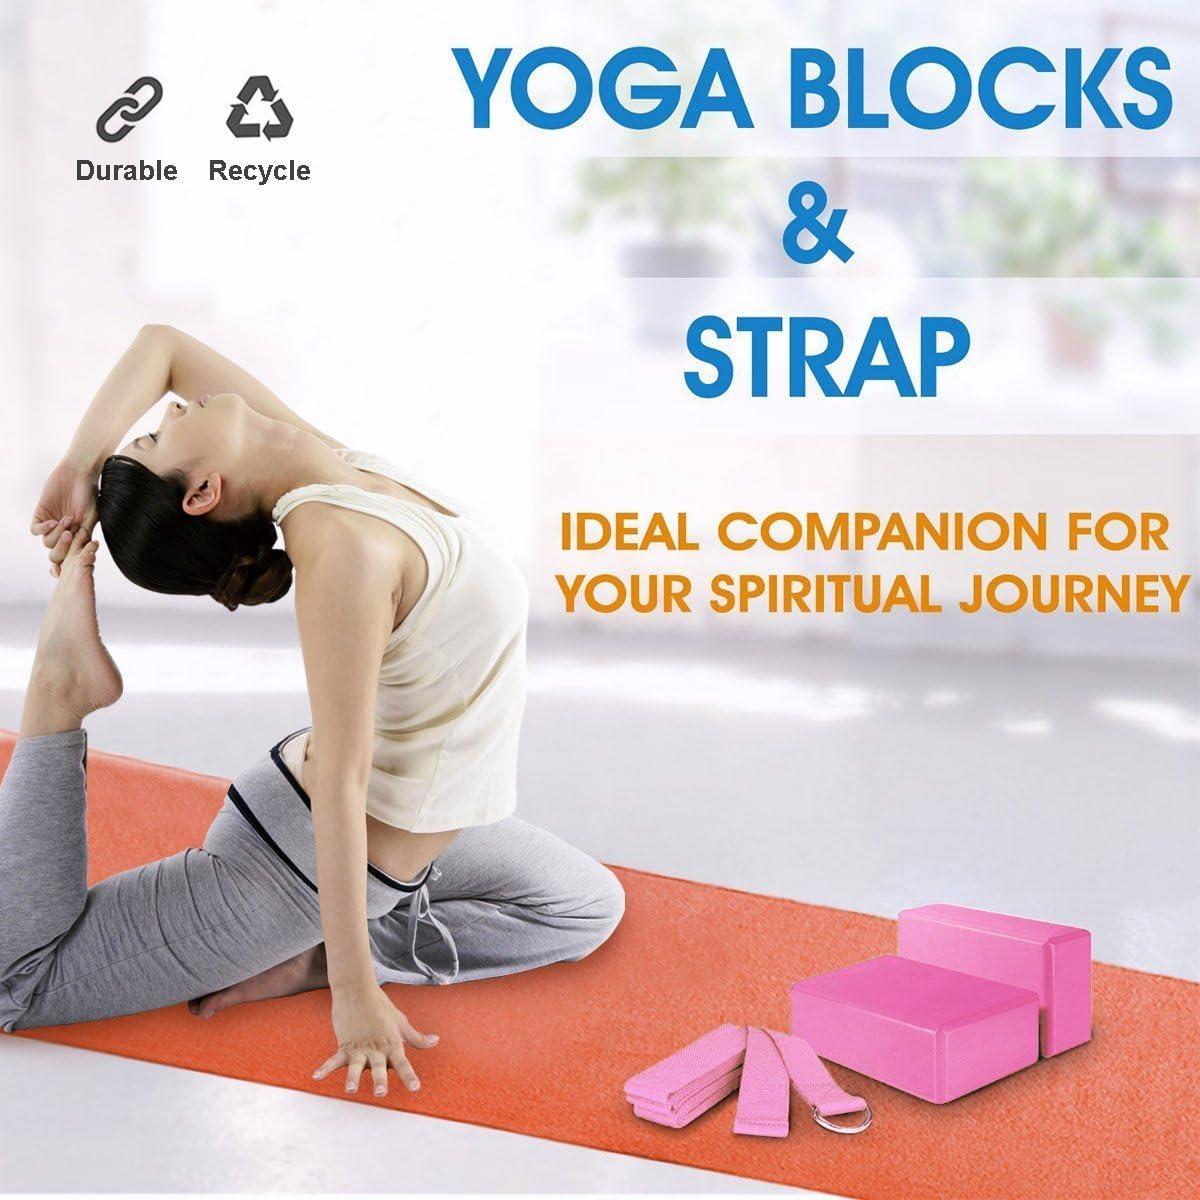 JIMS STORE 2pcs Yoga Bl/öcke mit 1.8m Yogagurt Yogablock//Yoga-Block Set Yoga und Pilates Training Dehn/übungen f/ür Anf/änger und Fortgeschrittene